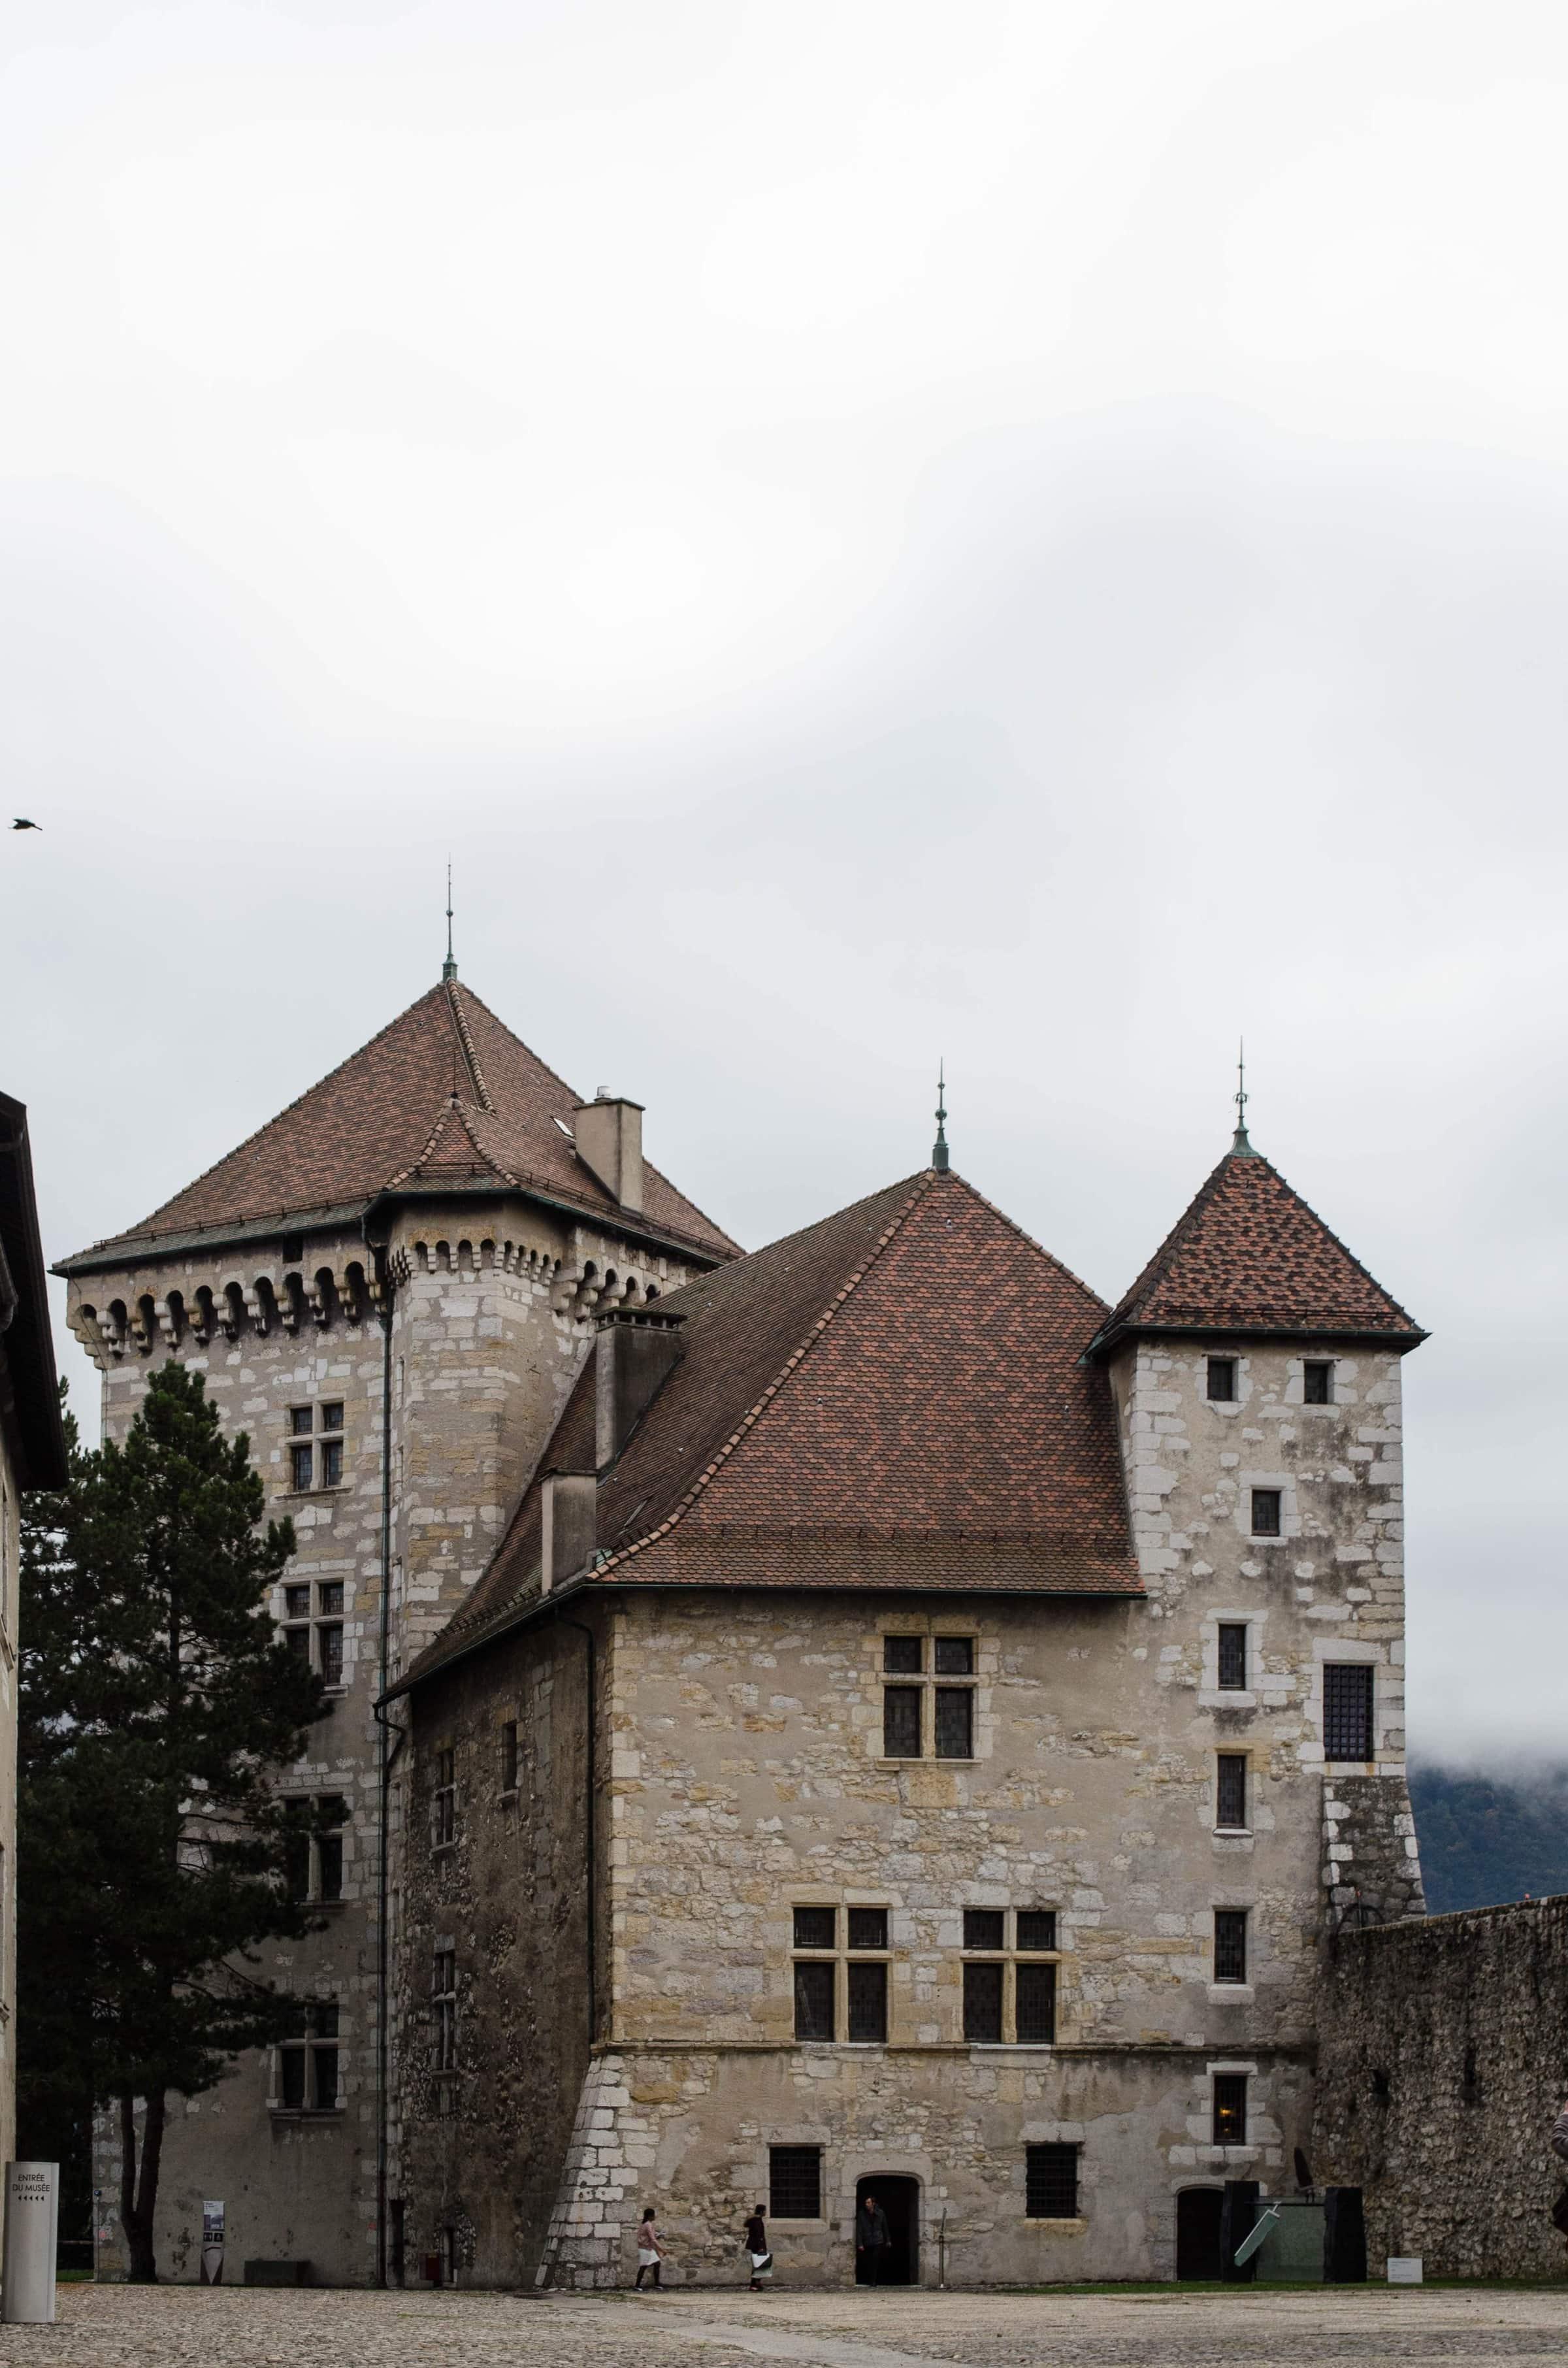 Schloss Annecy